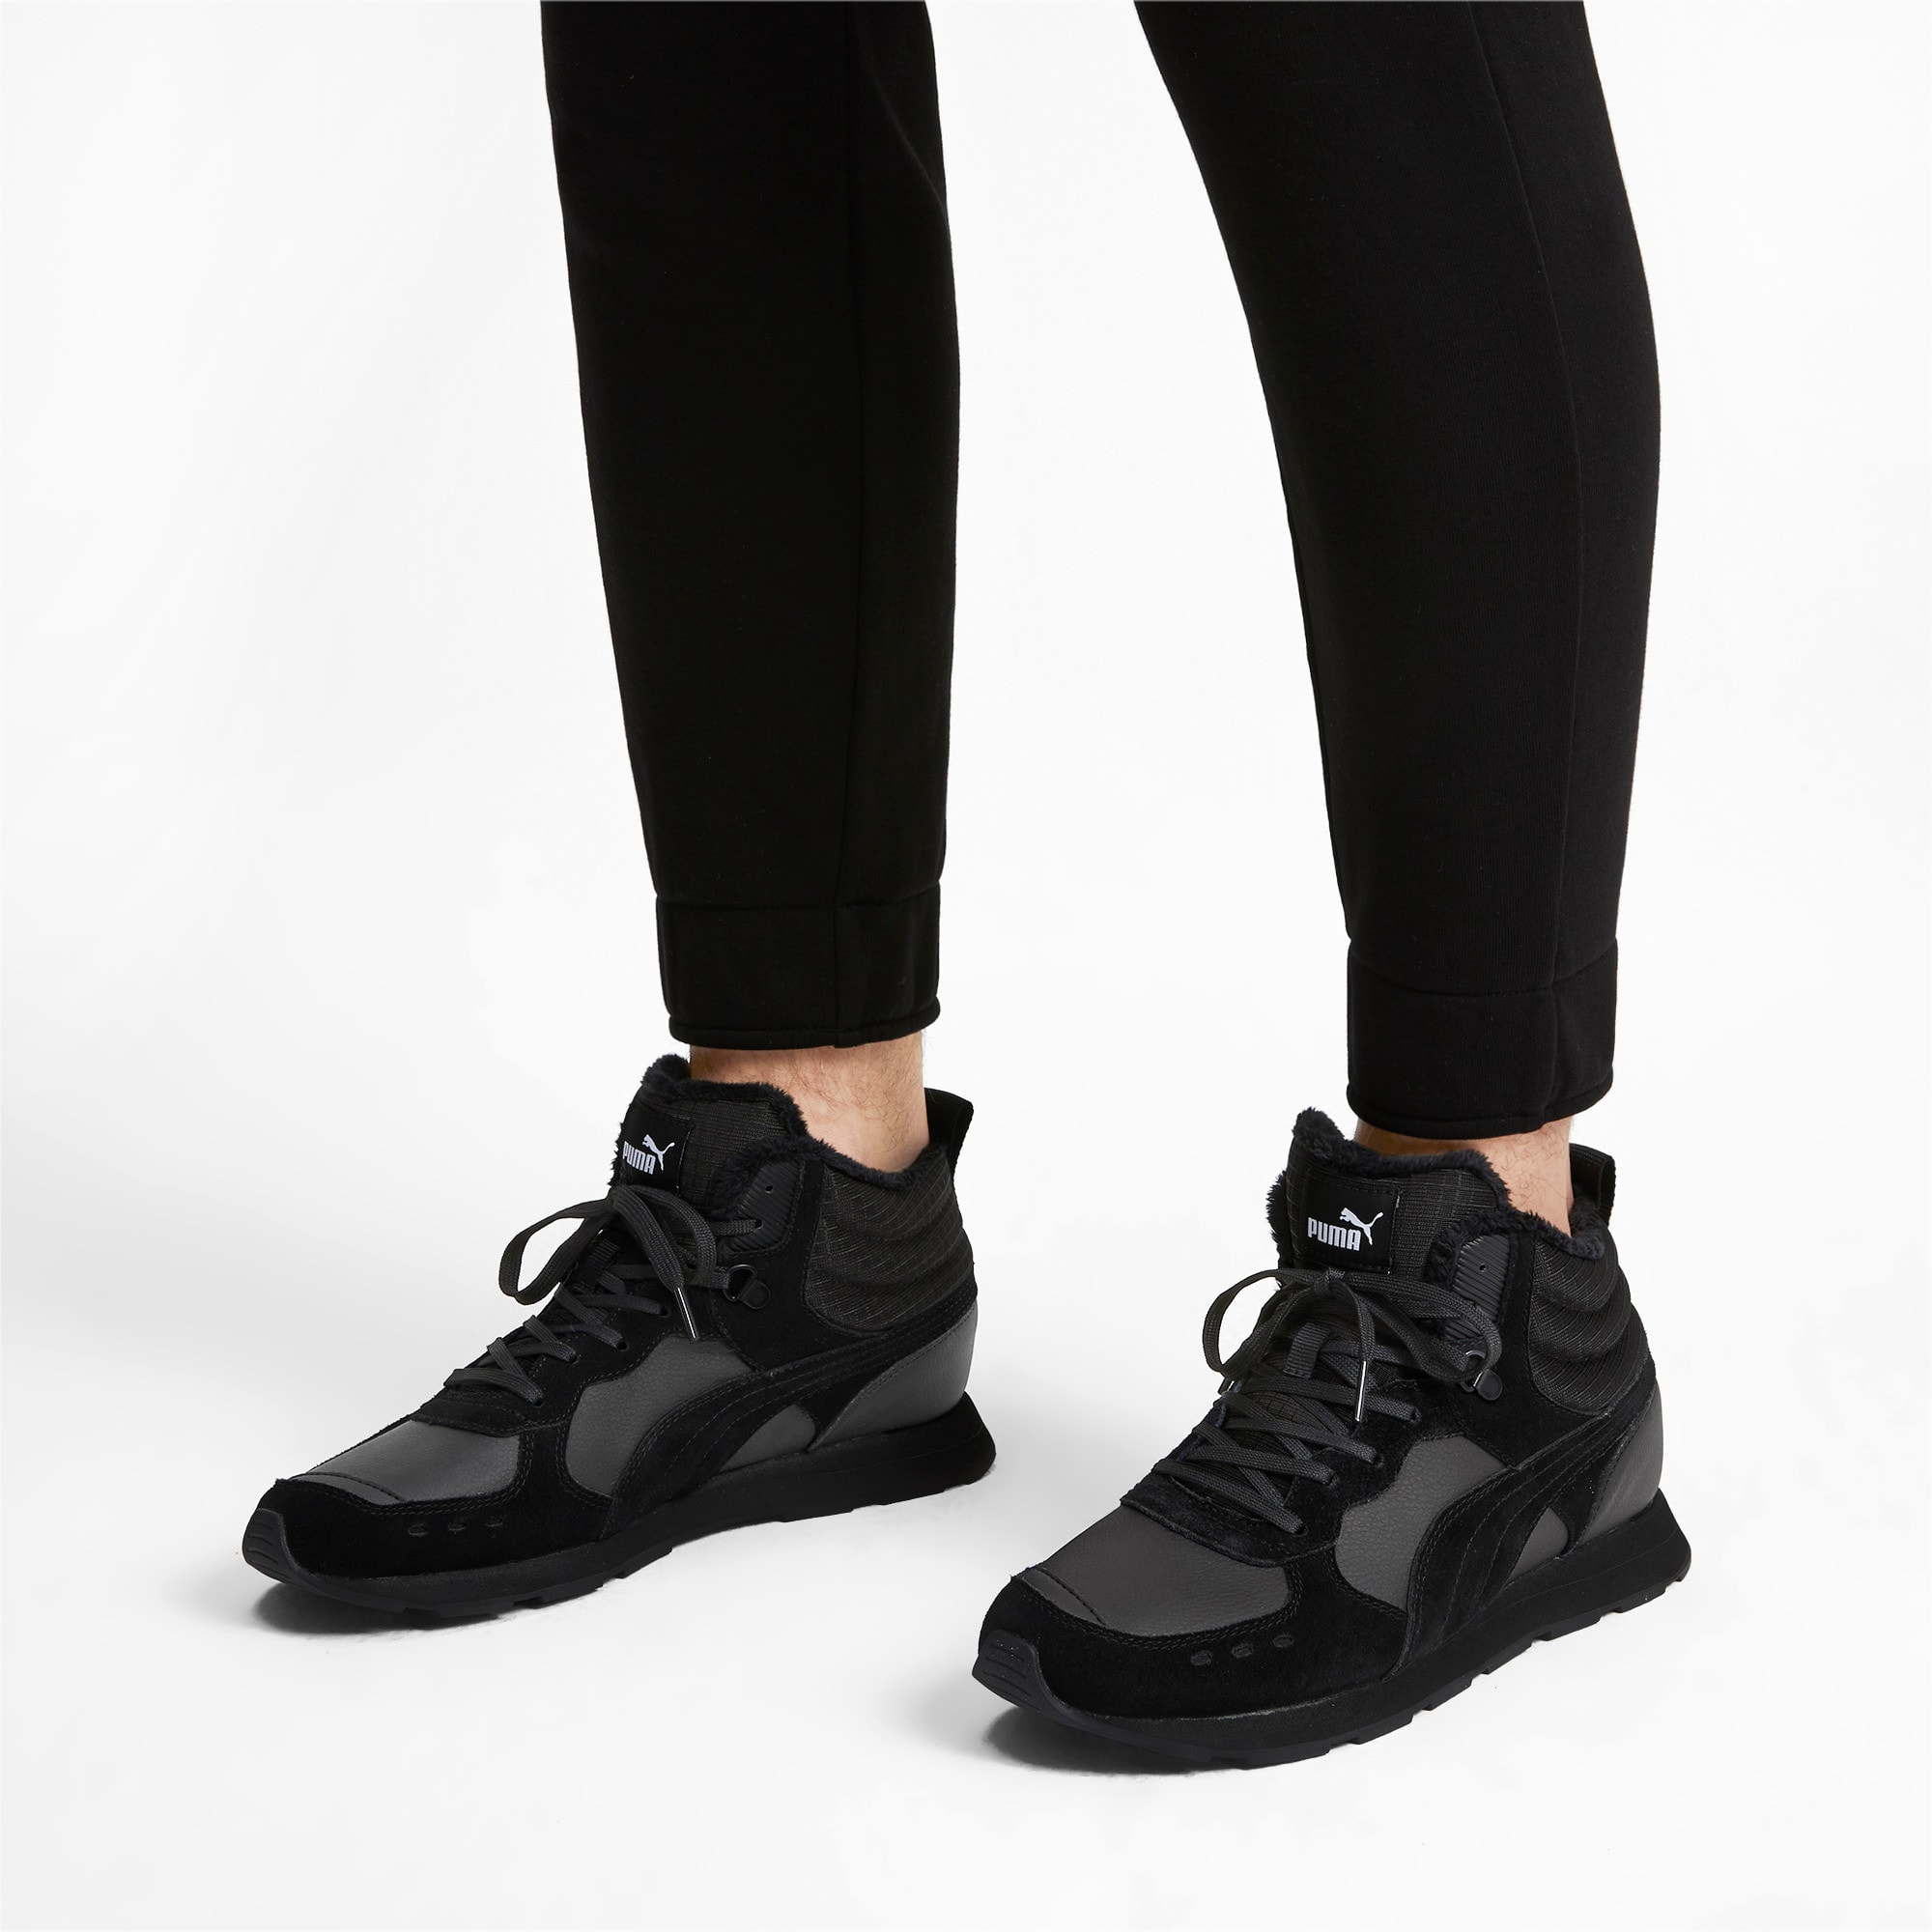 Anteprima 2 di Vista Mid-Cut Winter Running Shoes, Puma Black-Puma White, medio